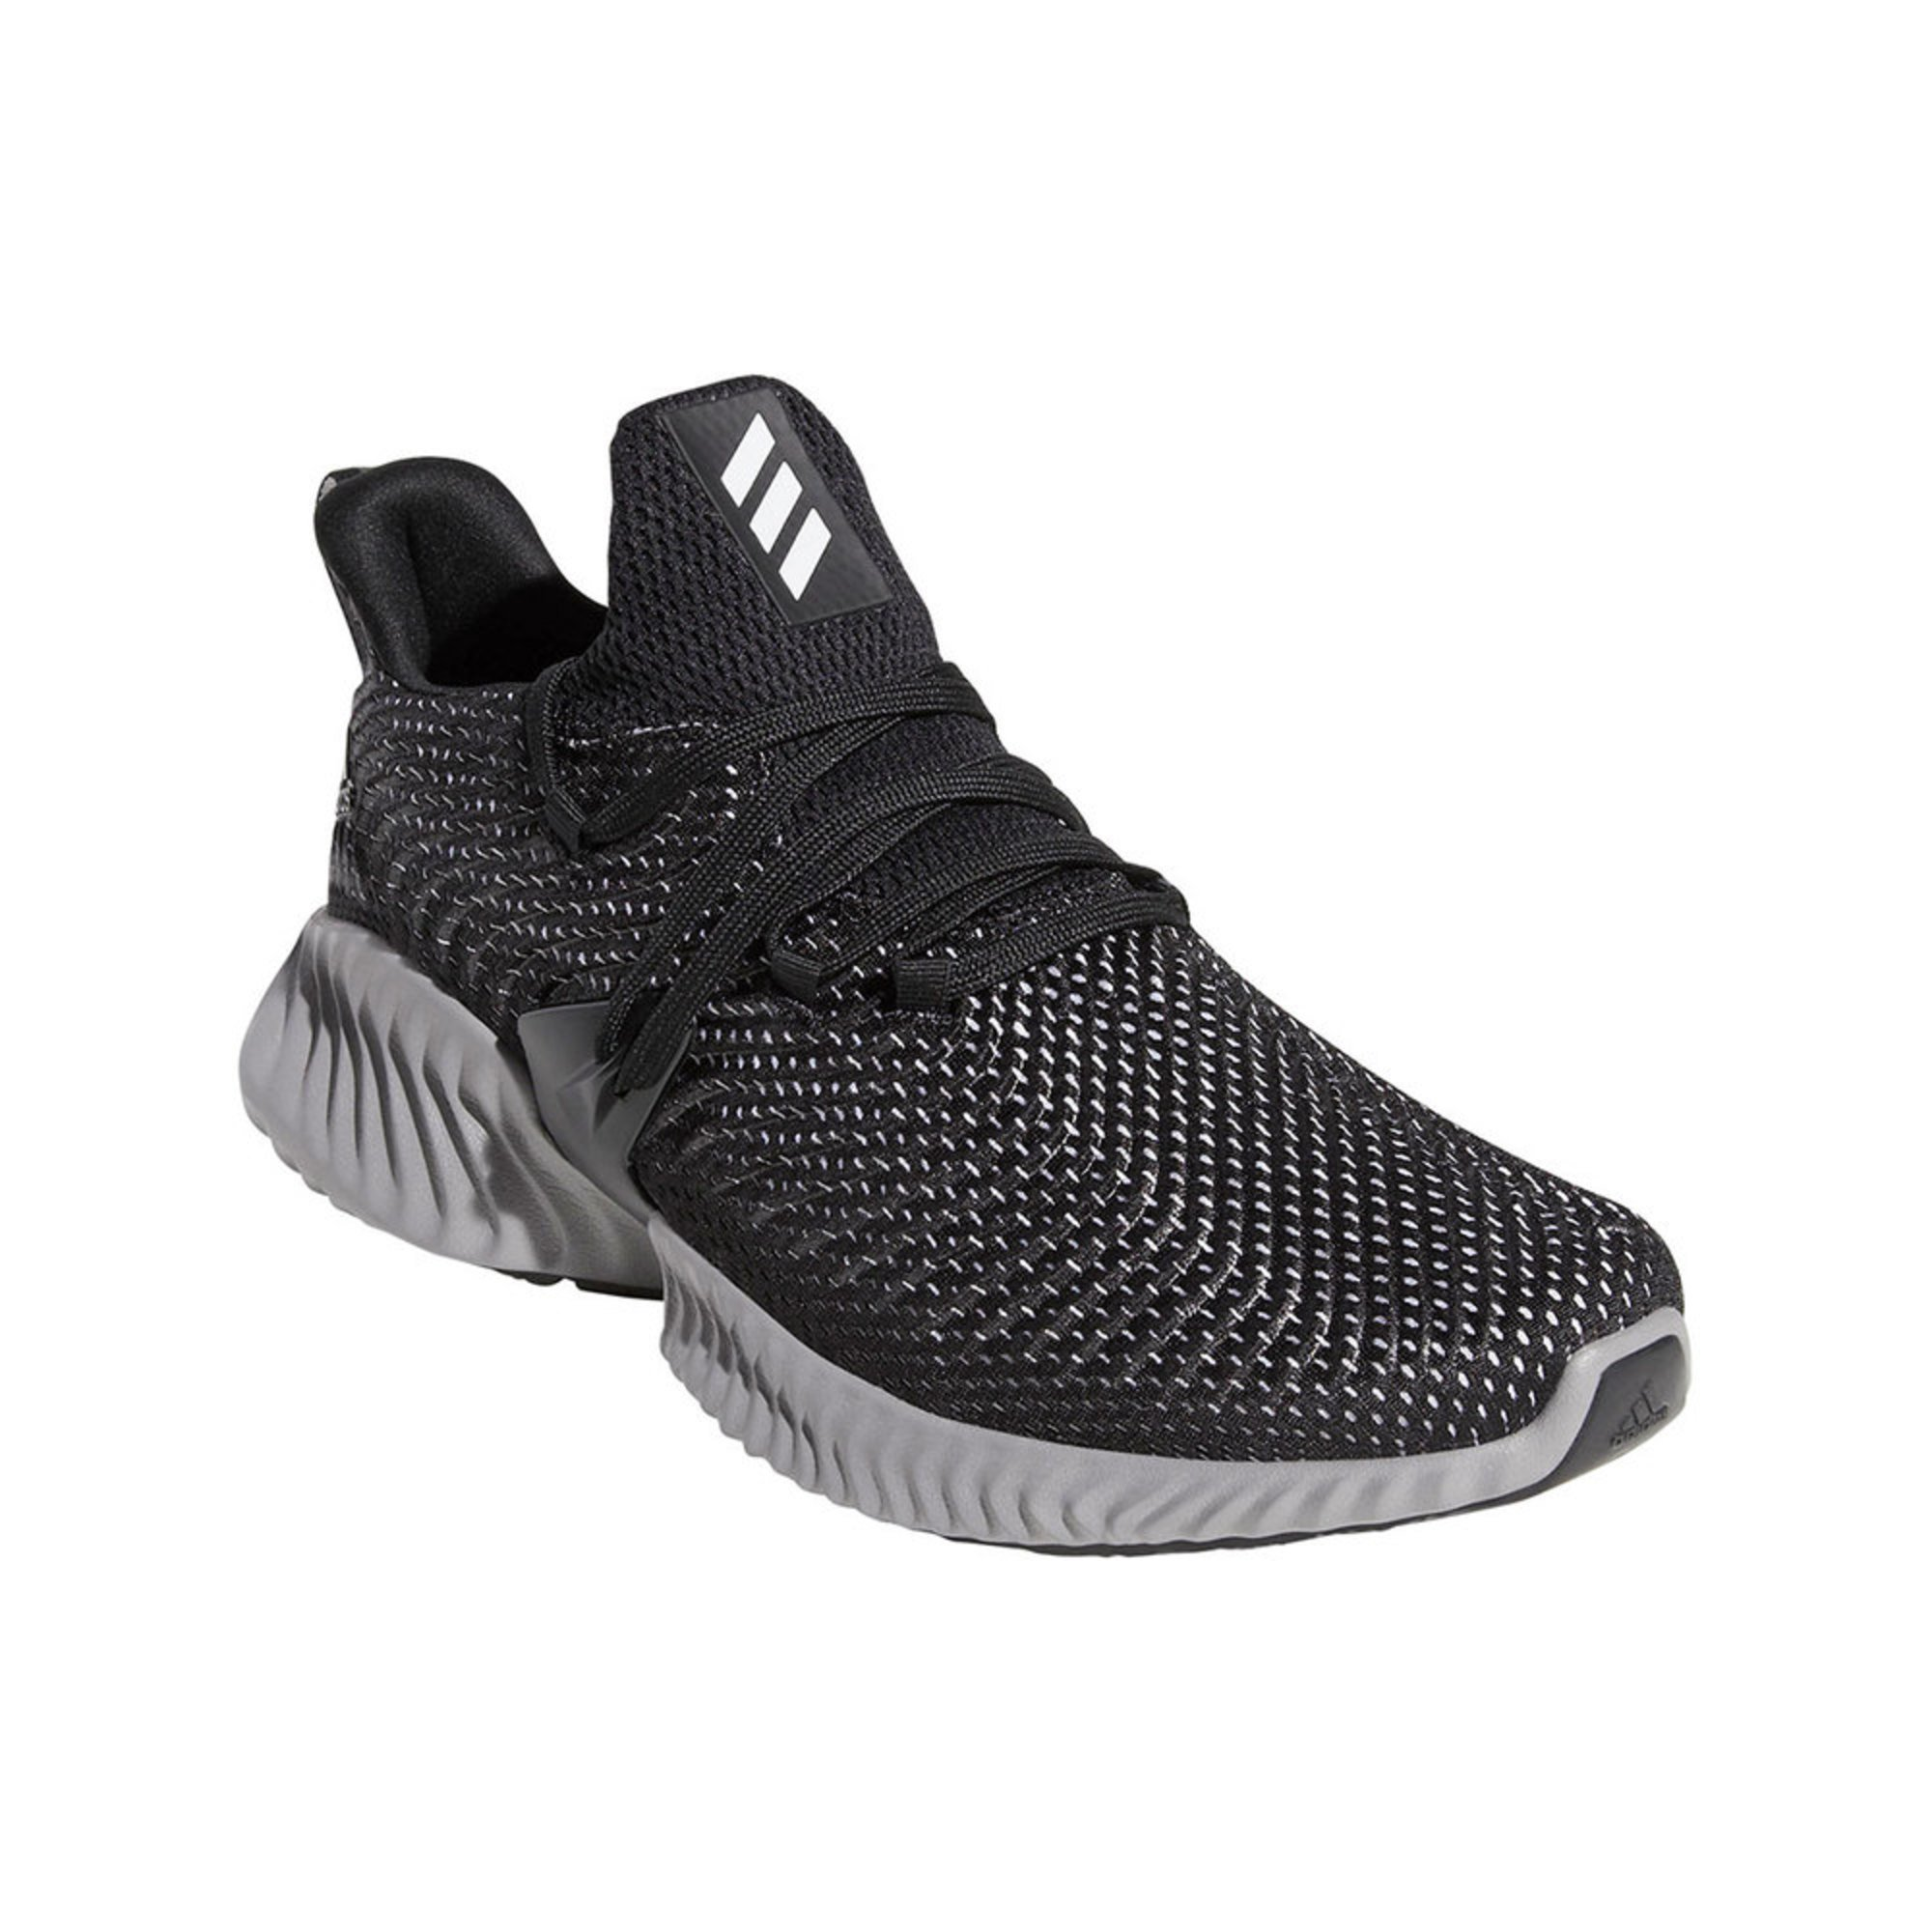 Adidas Mens Alphabounce Instinct Running Shoe | Men's